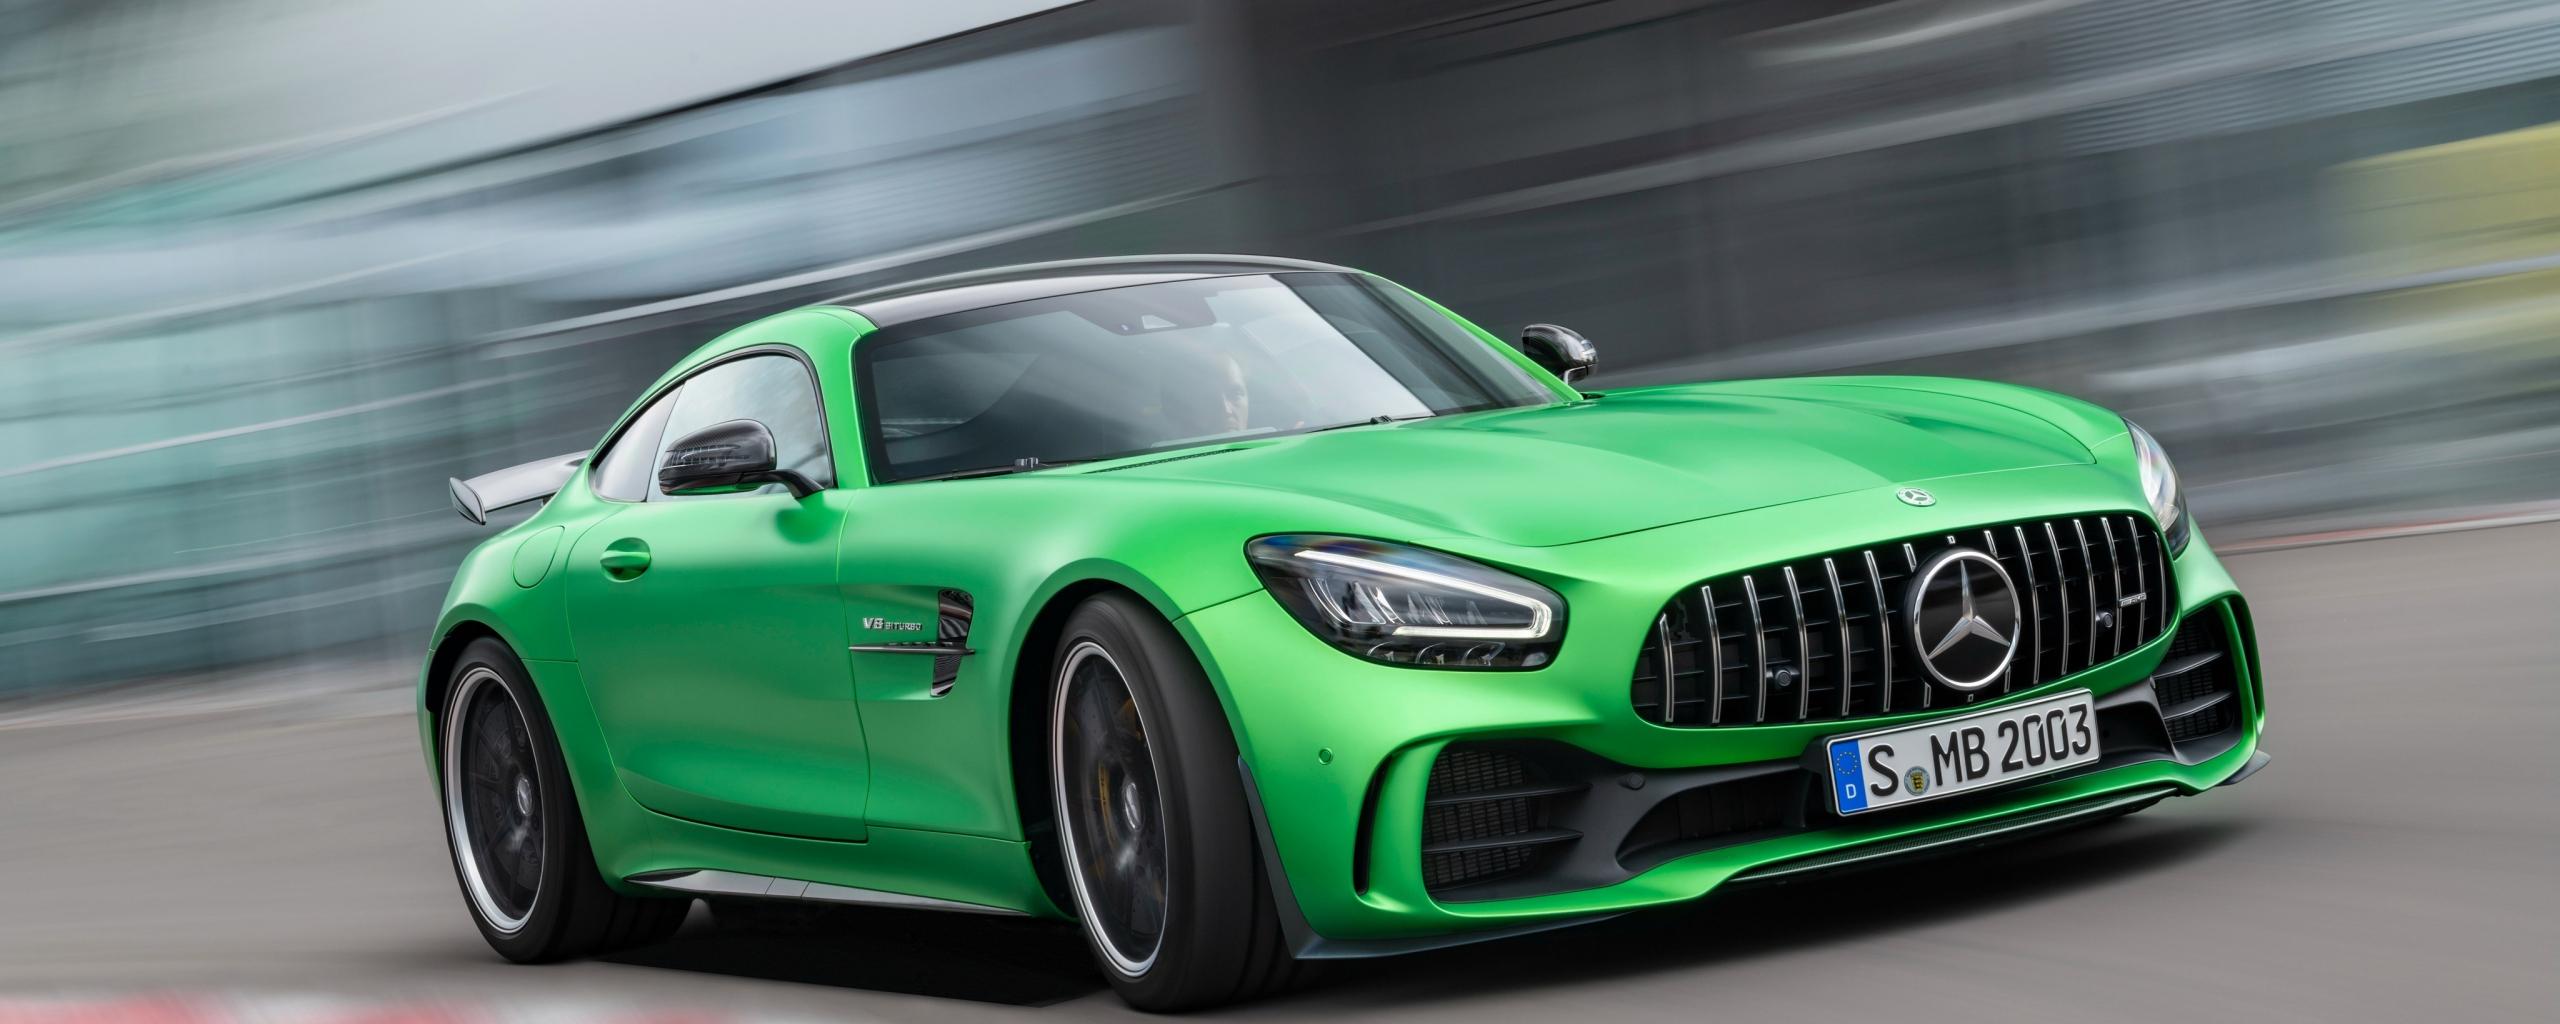 Mercedes-AMG GT, green car, on-road, 2560x1024 wallpaper